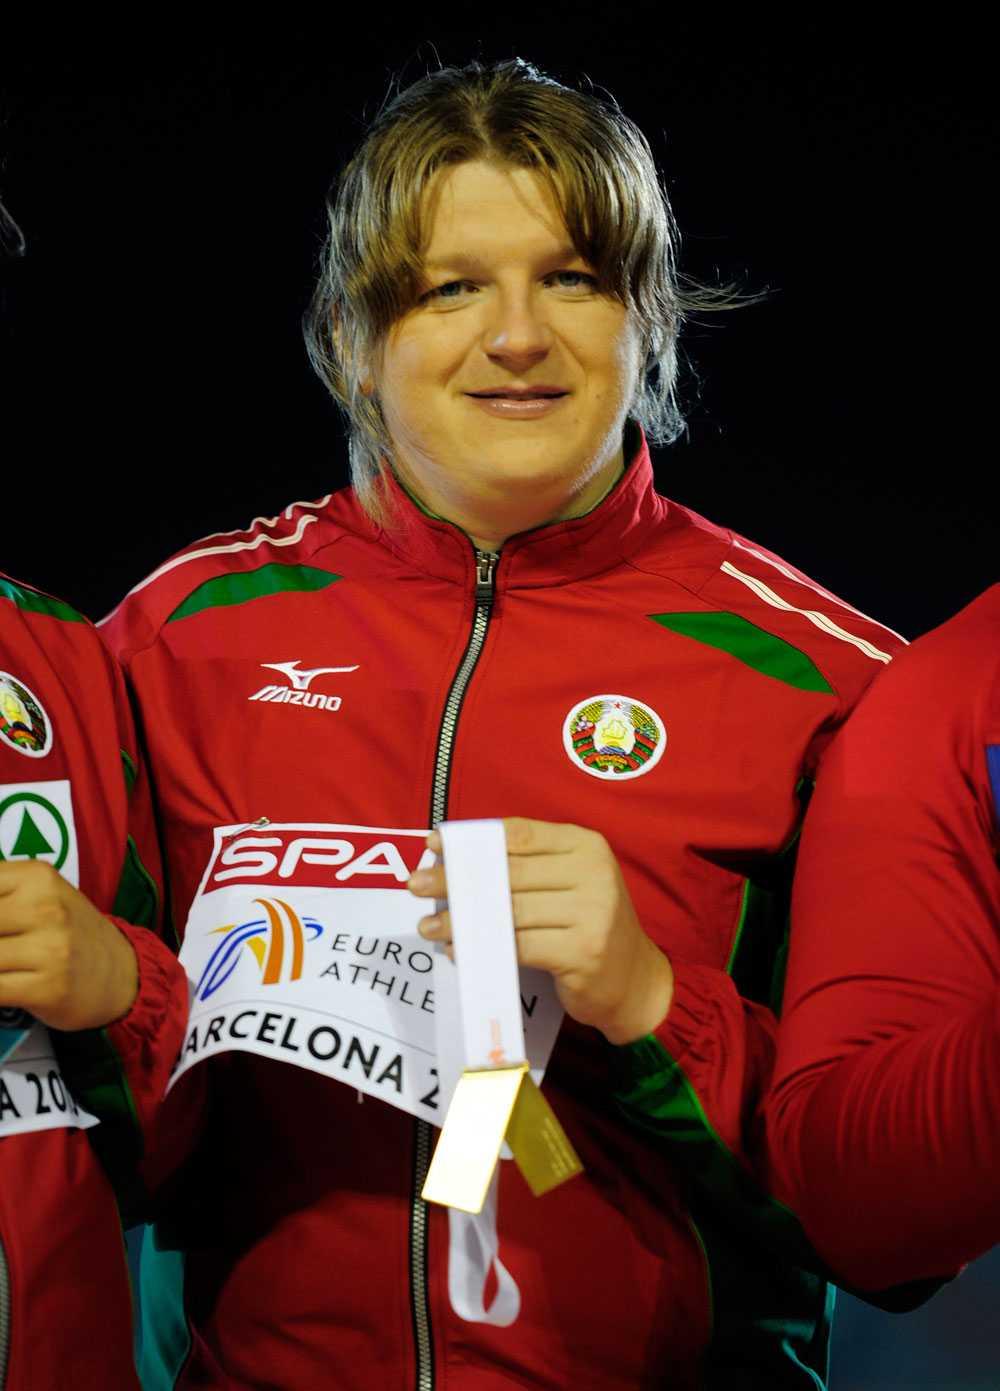 Med en guldmedalj i Barcelona 2010.